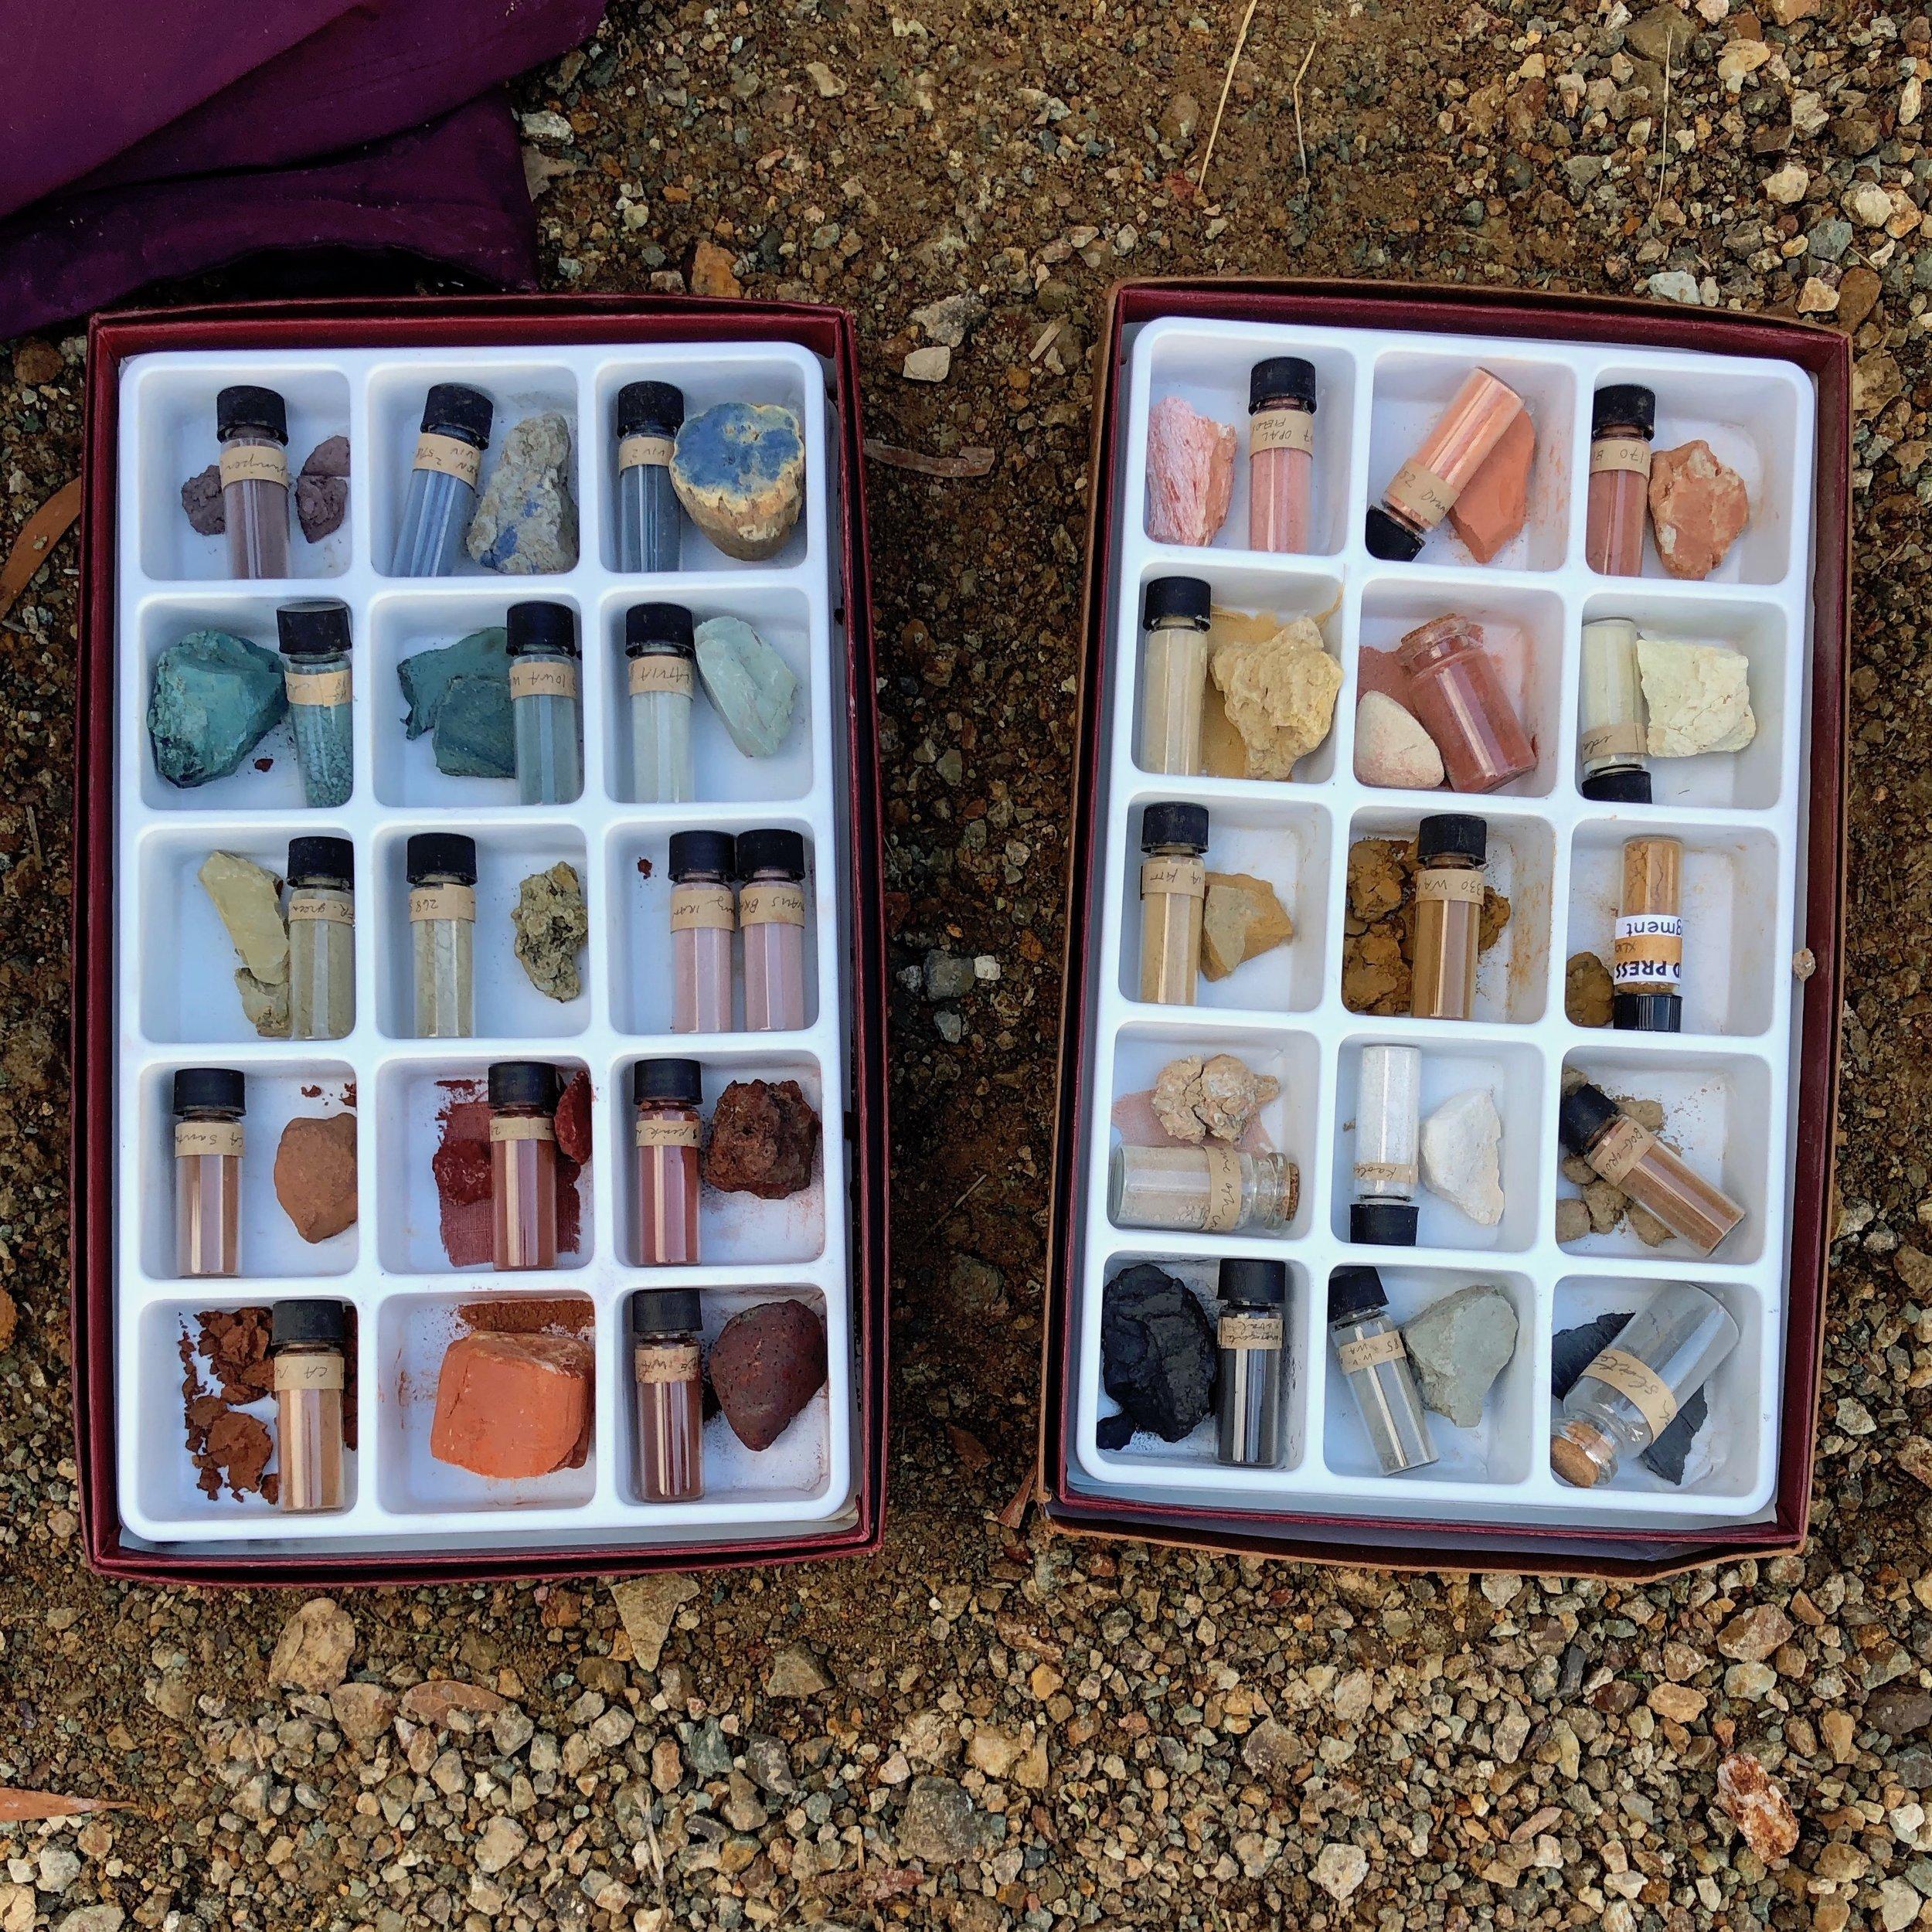 EARLY FUTURES - Visit Heidi's website: earlyfutures.comLearn about ochres: earlyfutures.com/about-ochre-pigmentsFollow her on Instagram: @heidilynnheidilynn